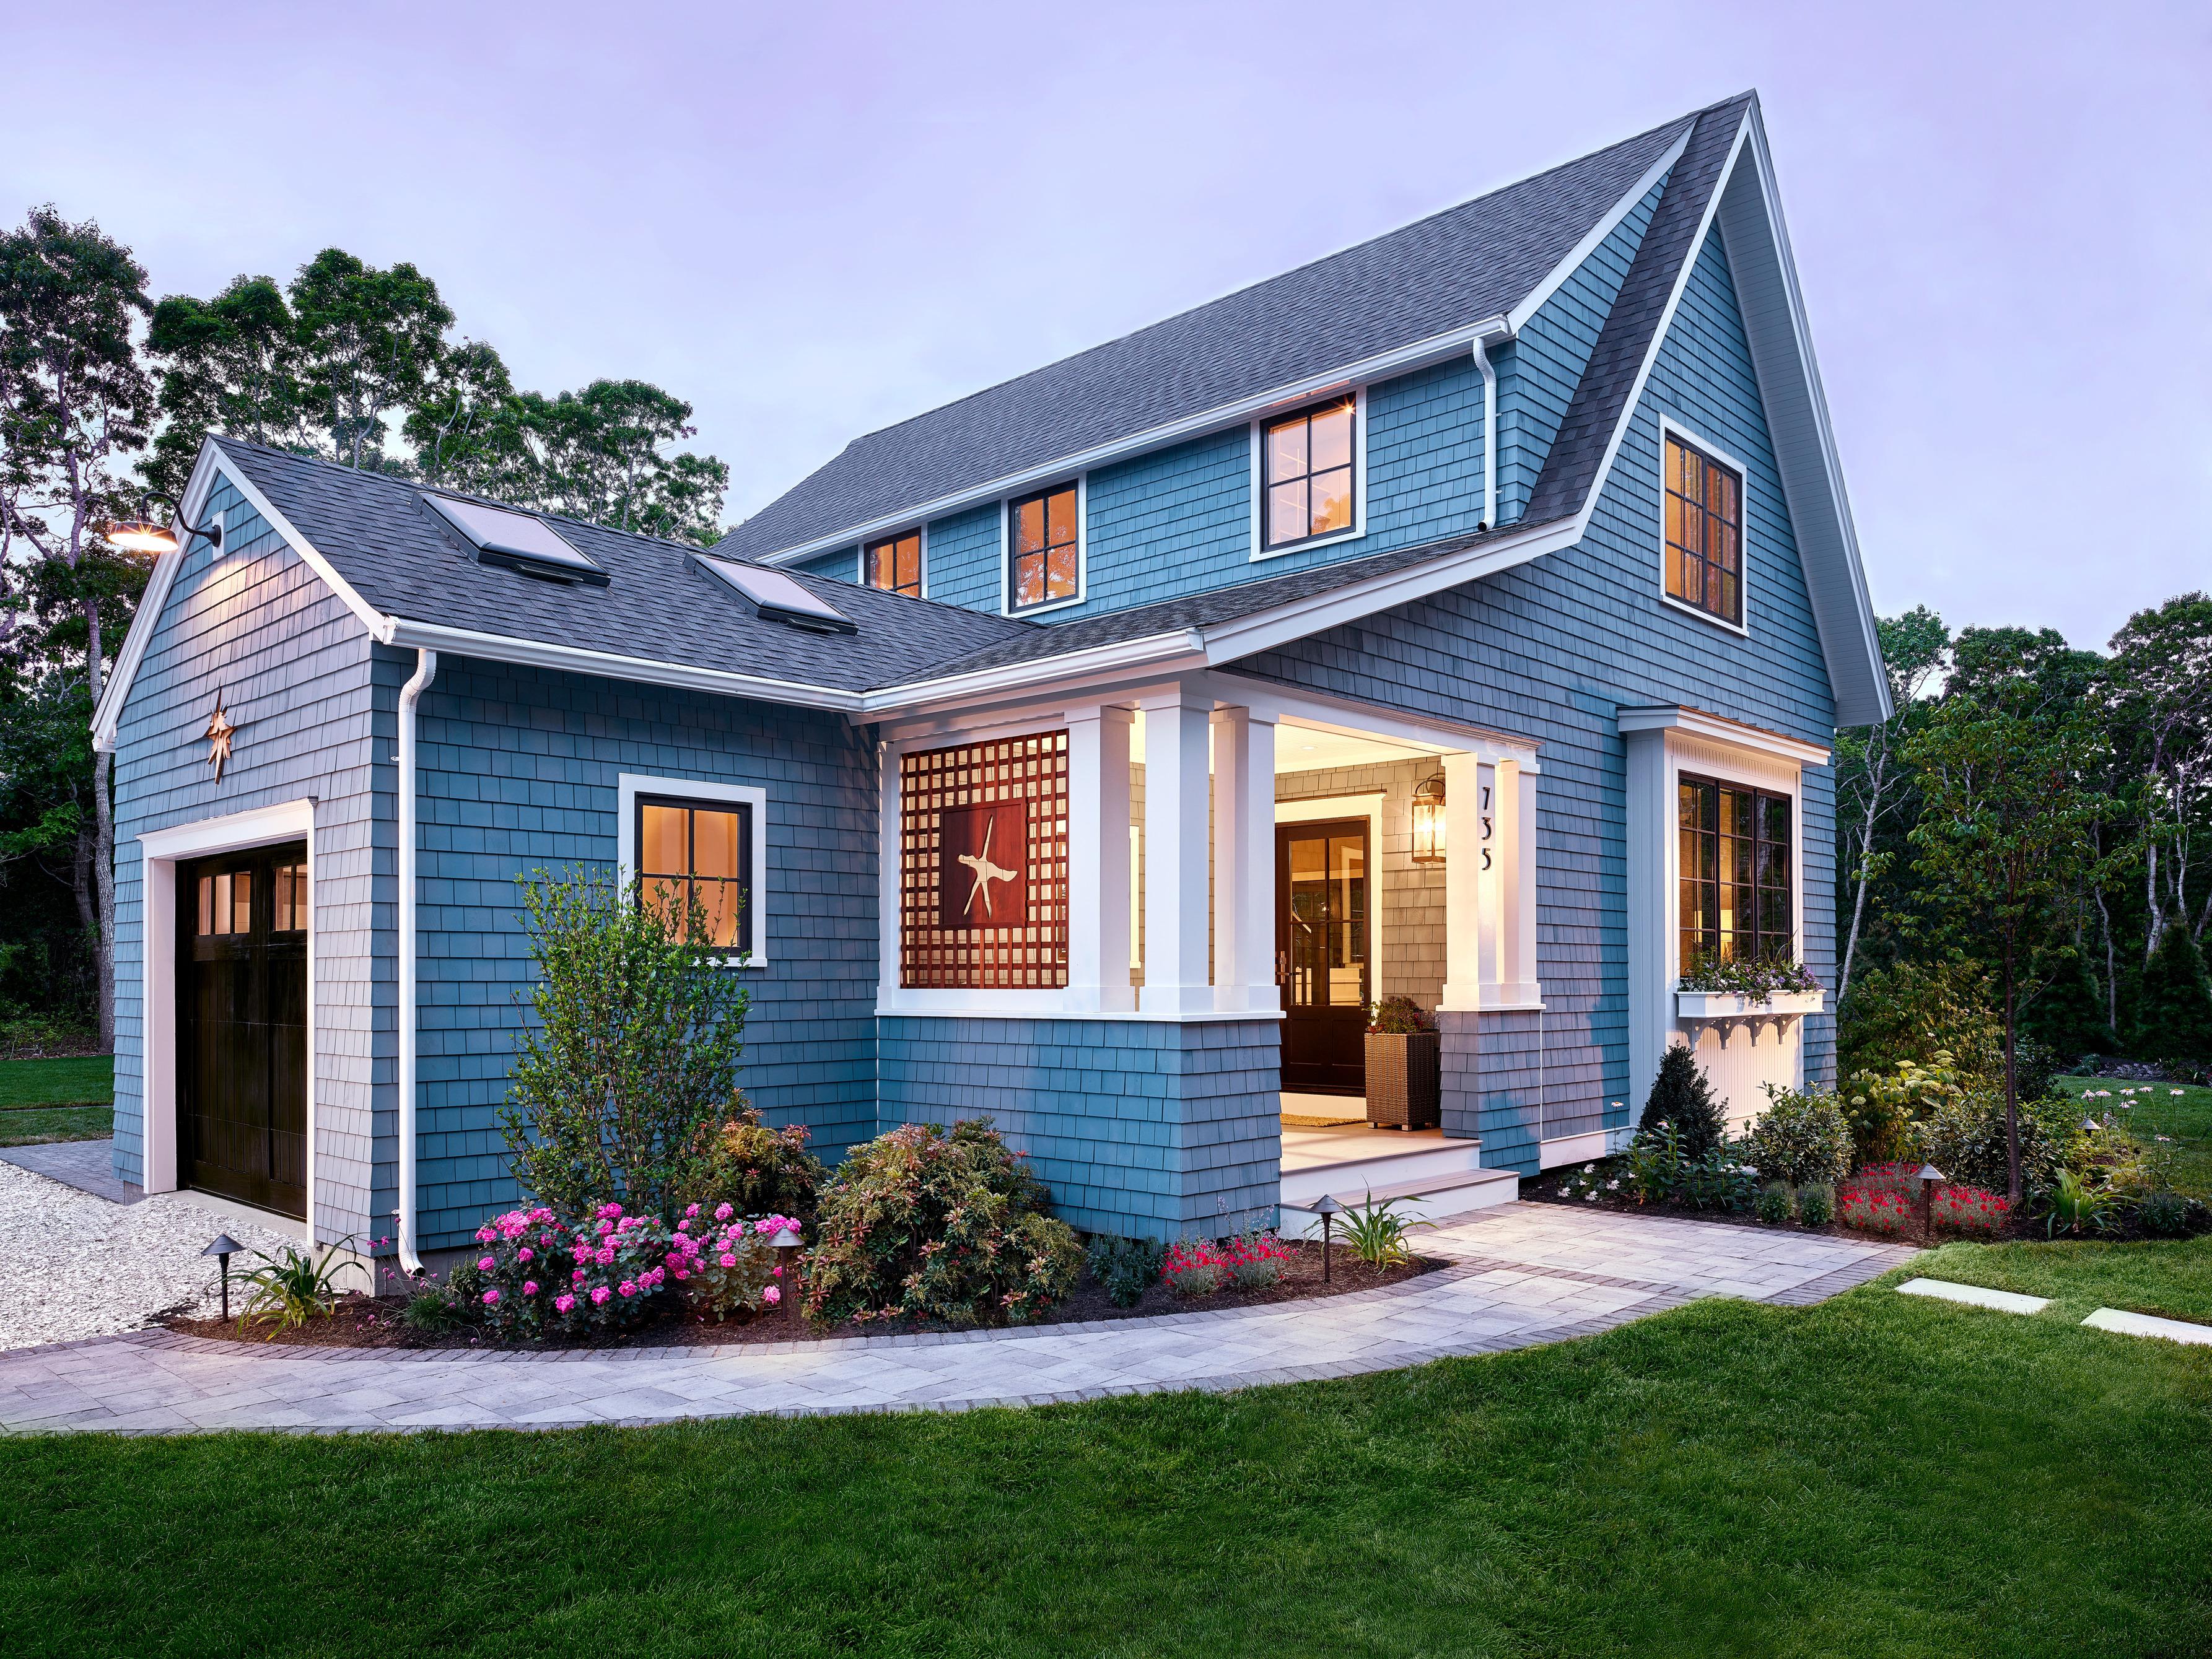 Cape Idea cottage